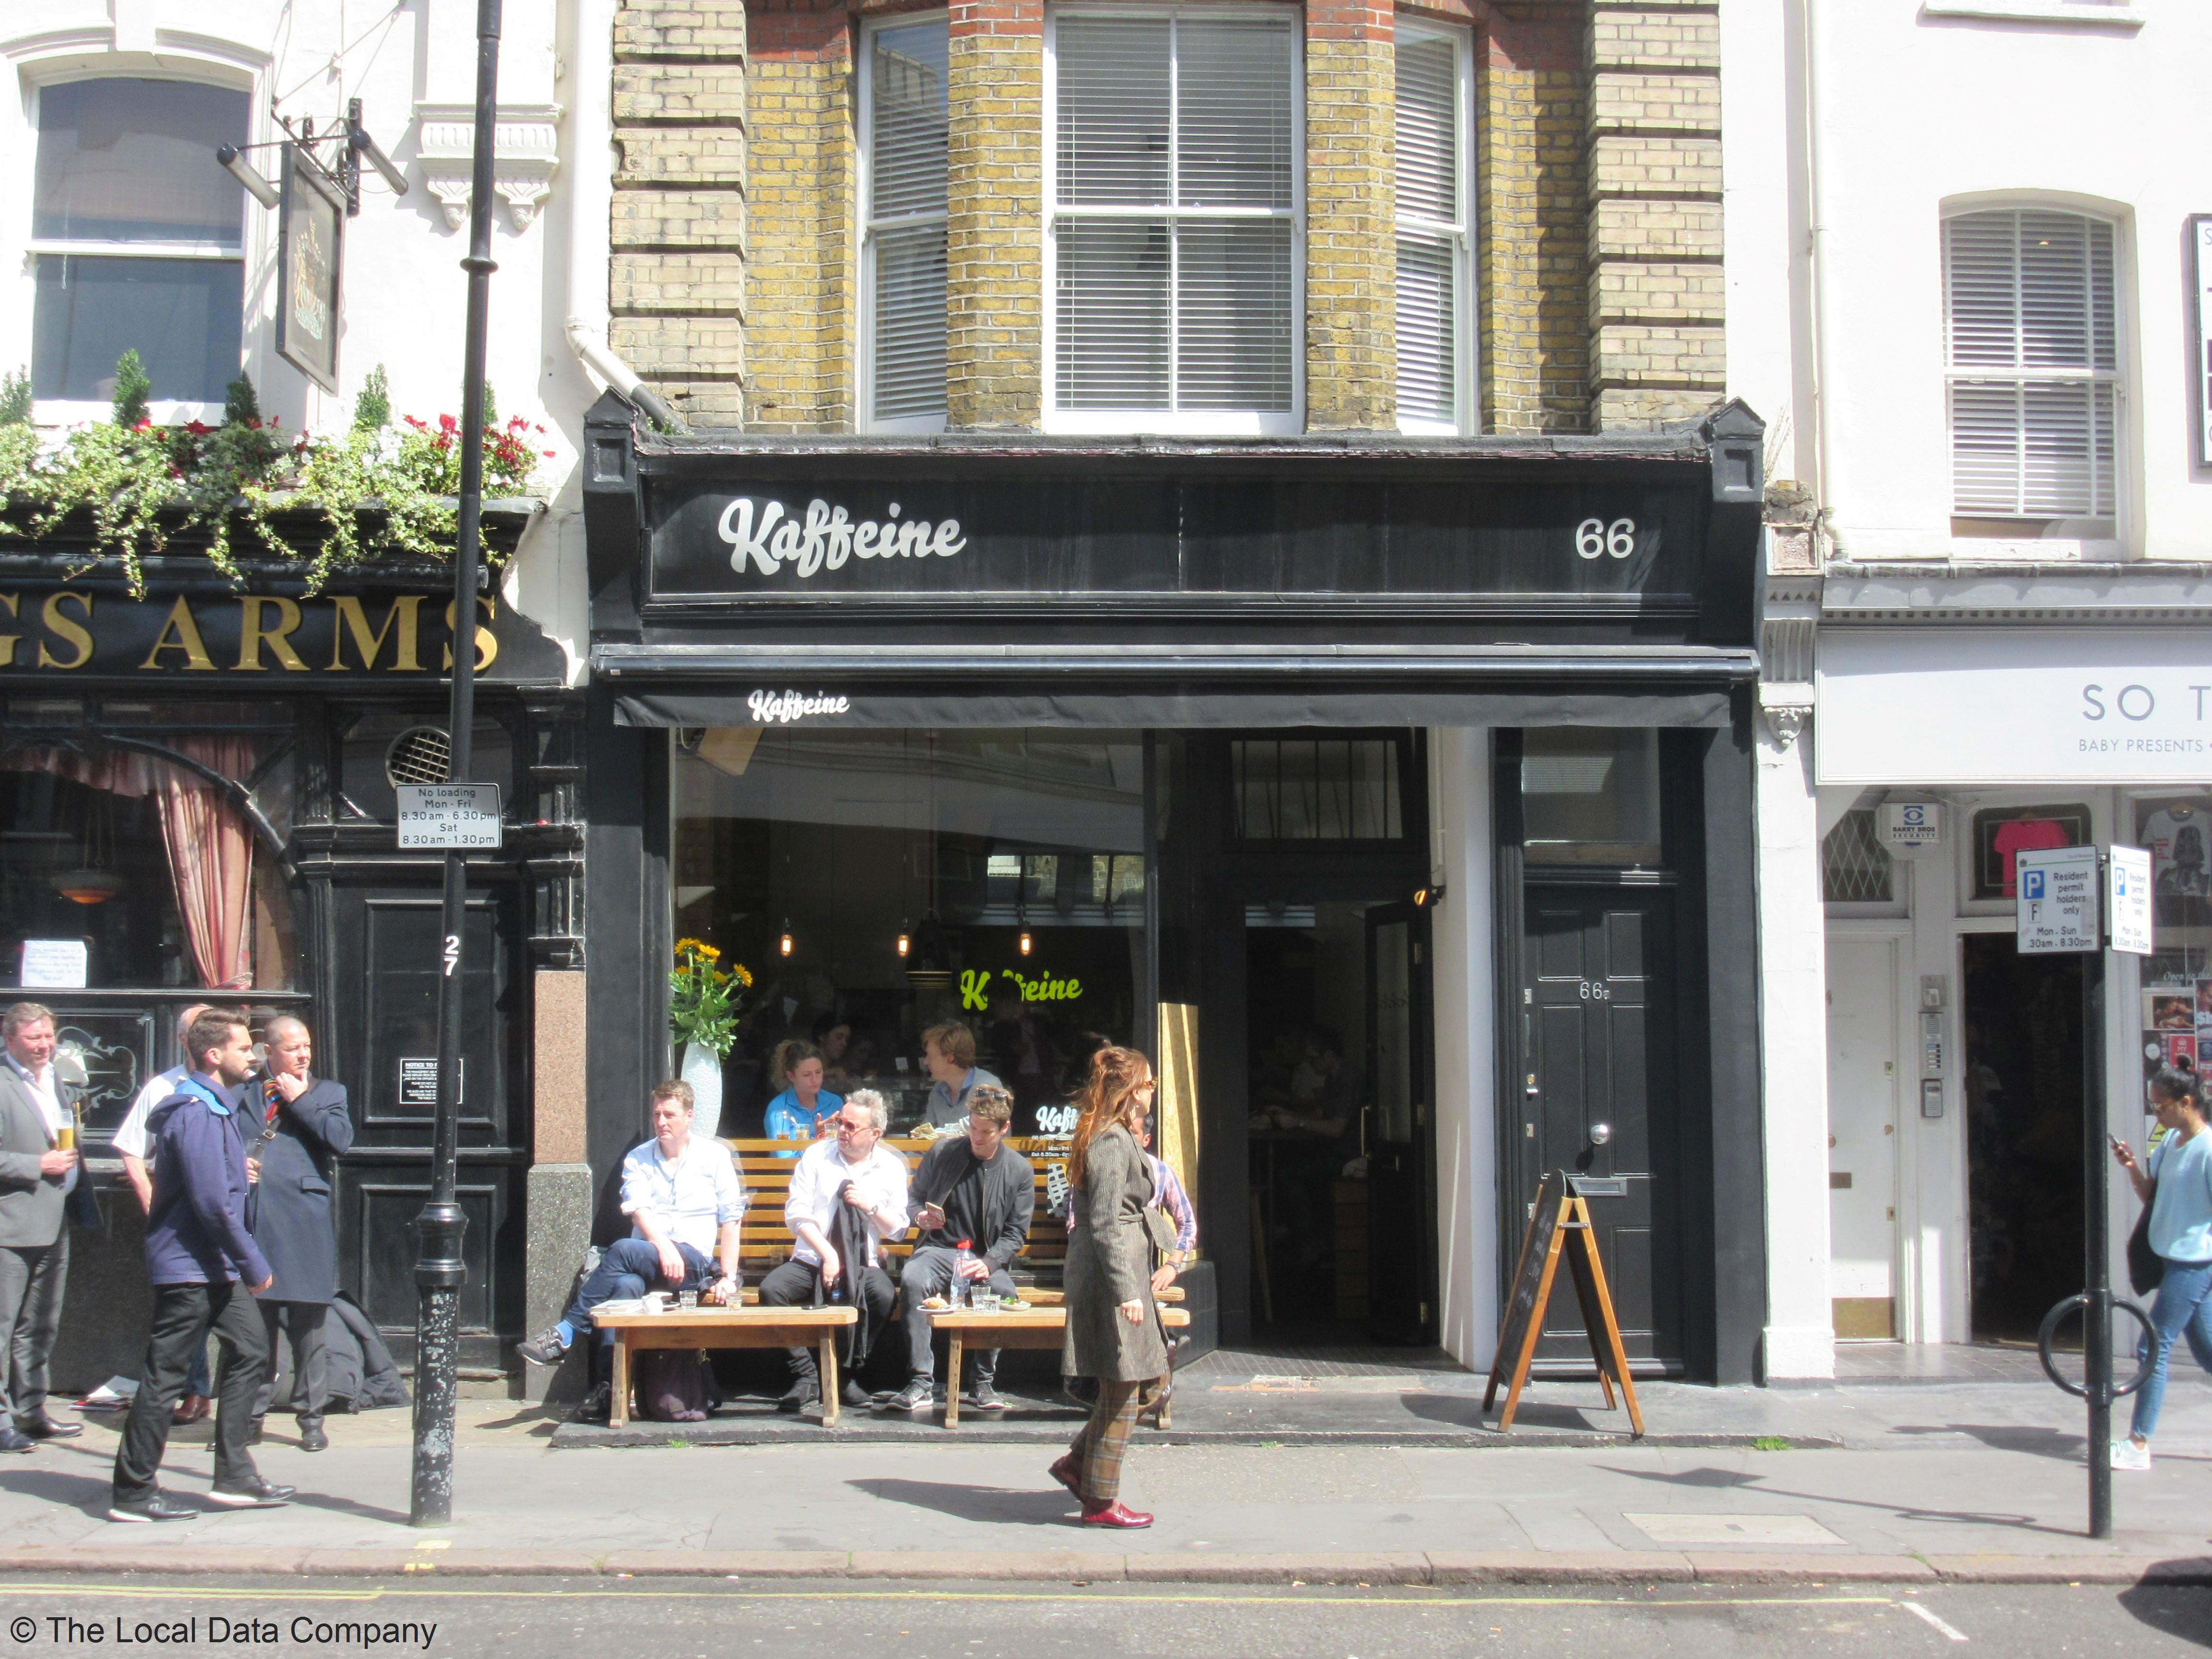 Kaffeine Great Titchfield Street London copy.jpg